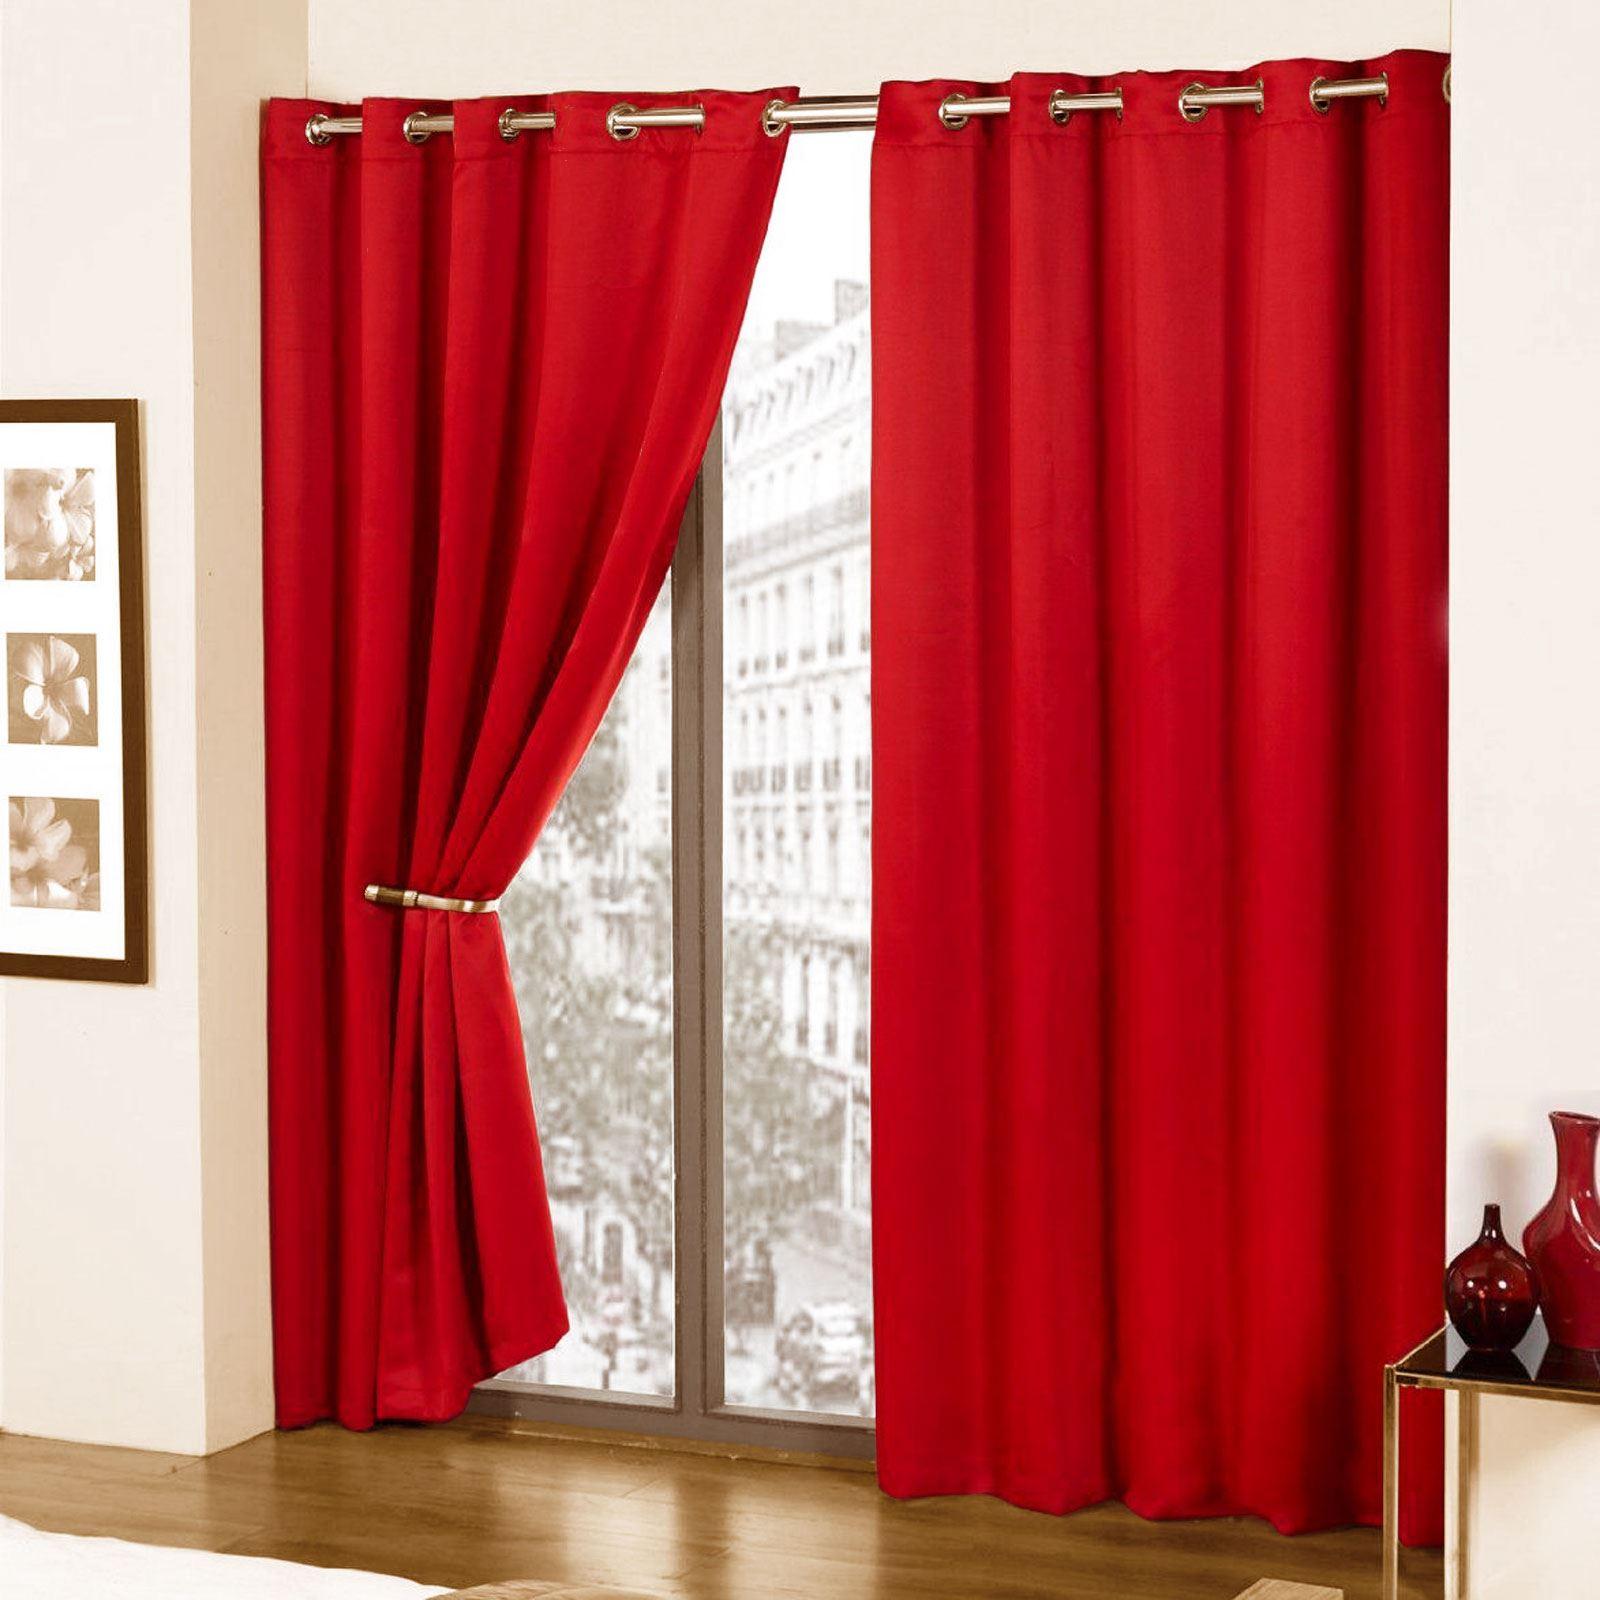 charter curtain home dupioni best silk caring curtains ideas